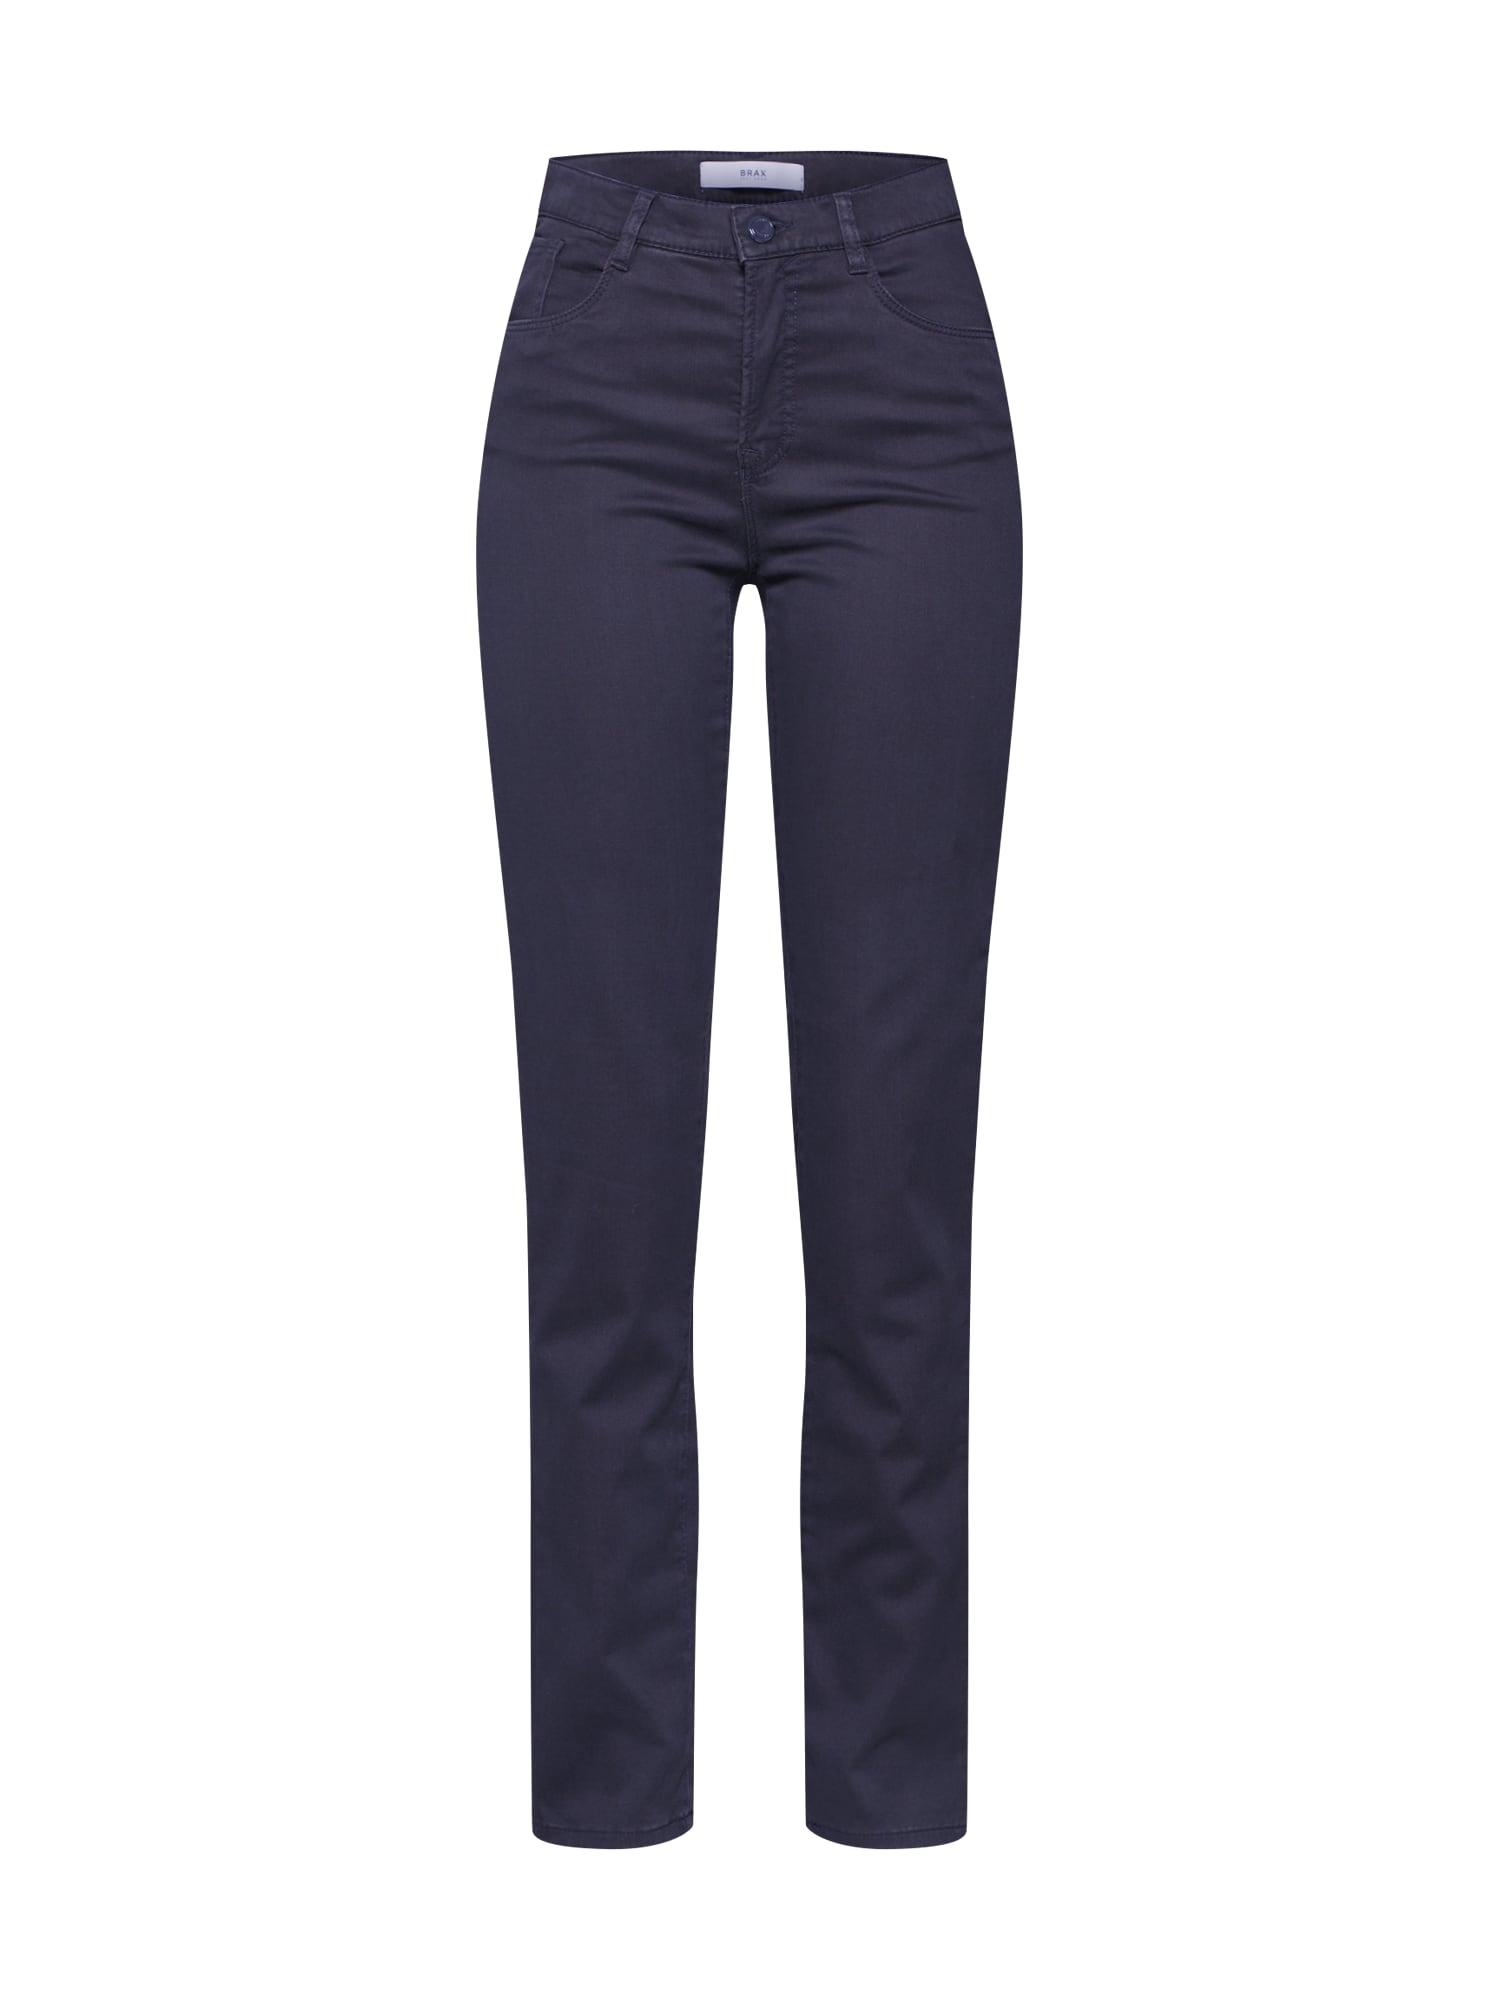 BRAX Kelnės 'Mary' pilka